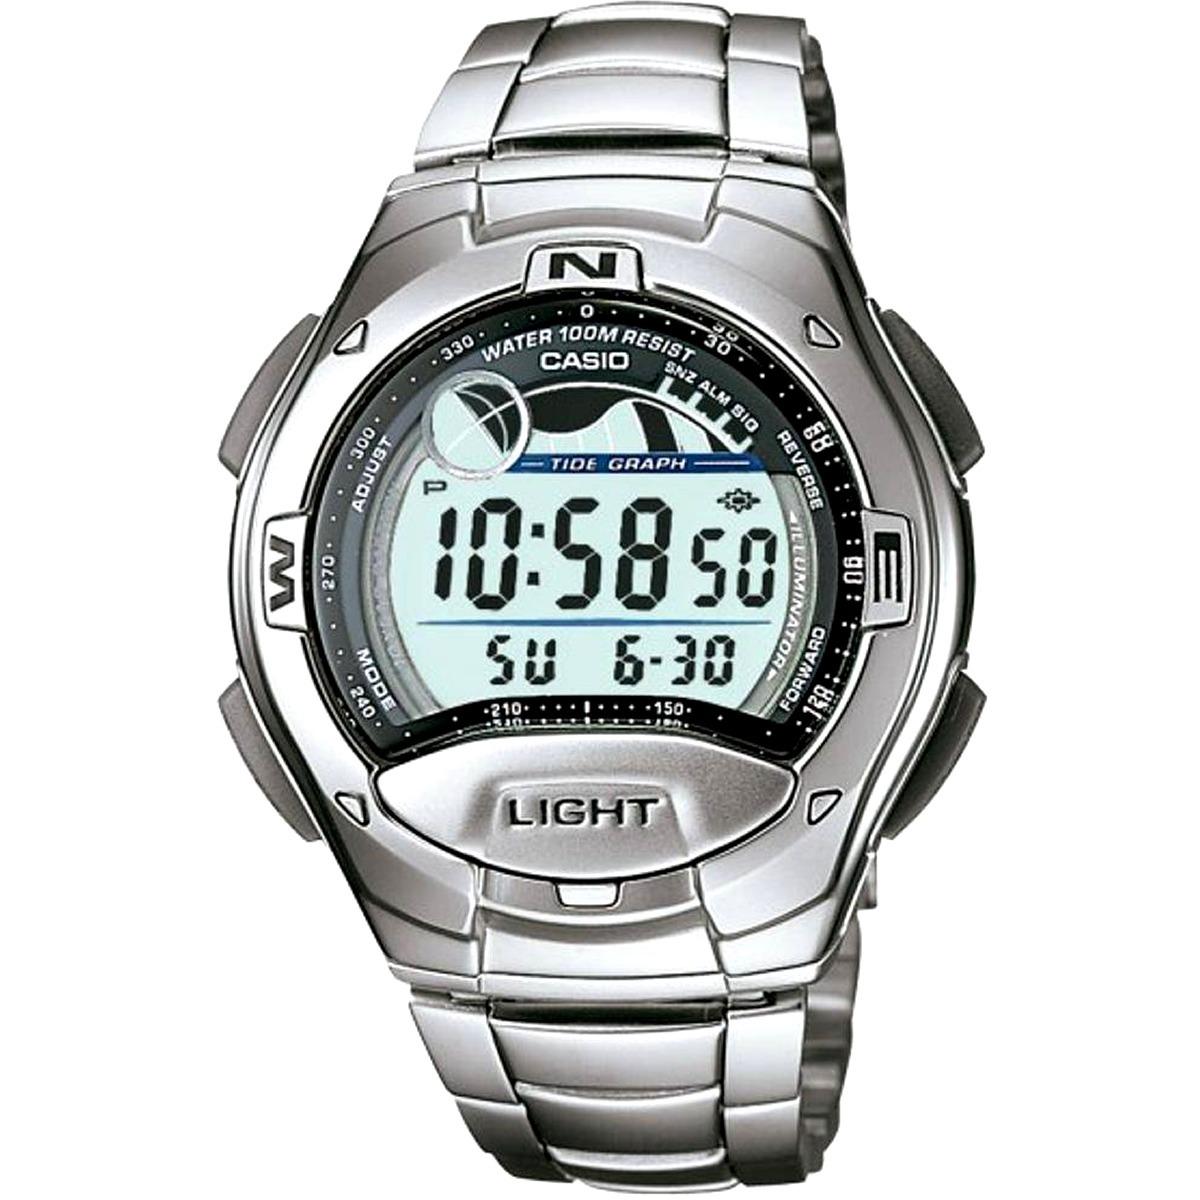 e822cb83f51 relógio masculino digital casio w-753d-1avdf - prata. Carregando zoom.